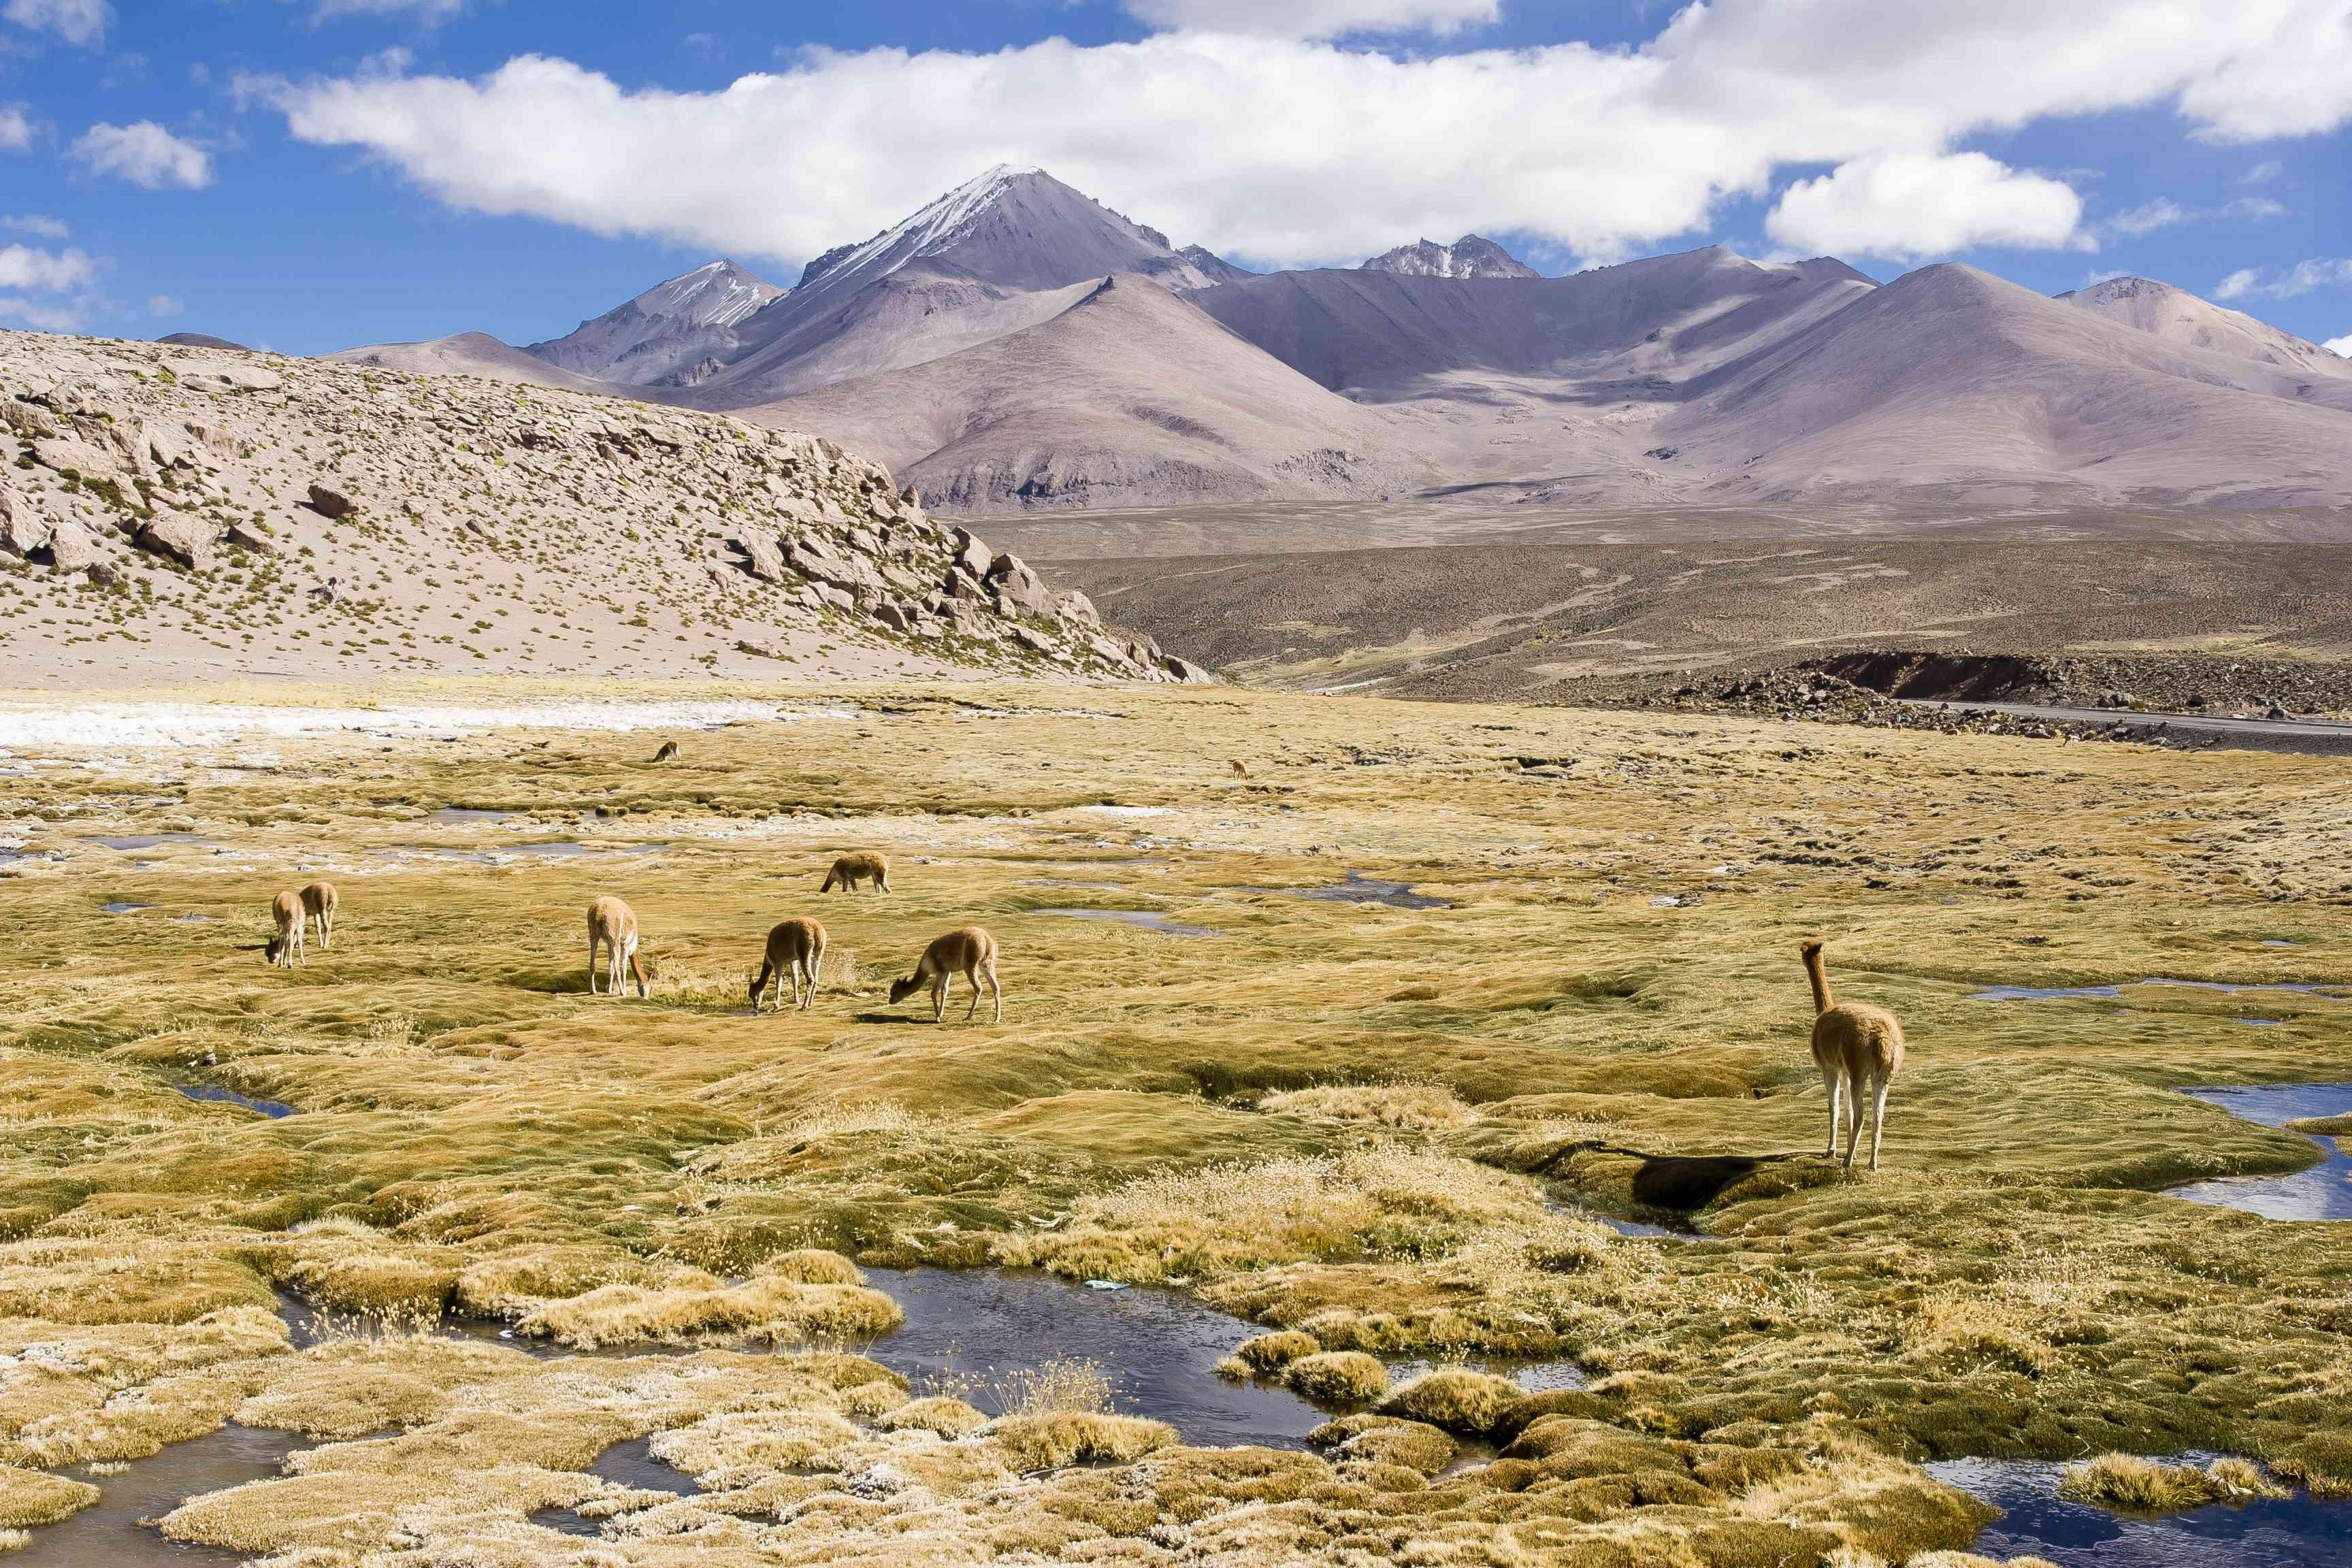 Group of vicuñas (Vicugna vicugna) grazing on a bofedal, Lauca National Park, Arica-Parinacota Region, Chile, South America